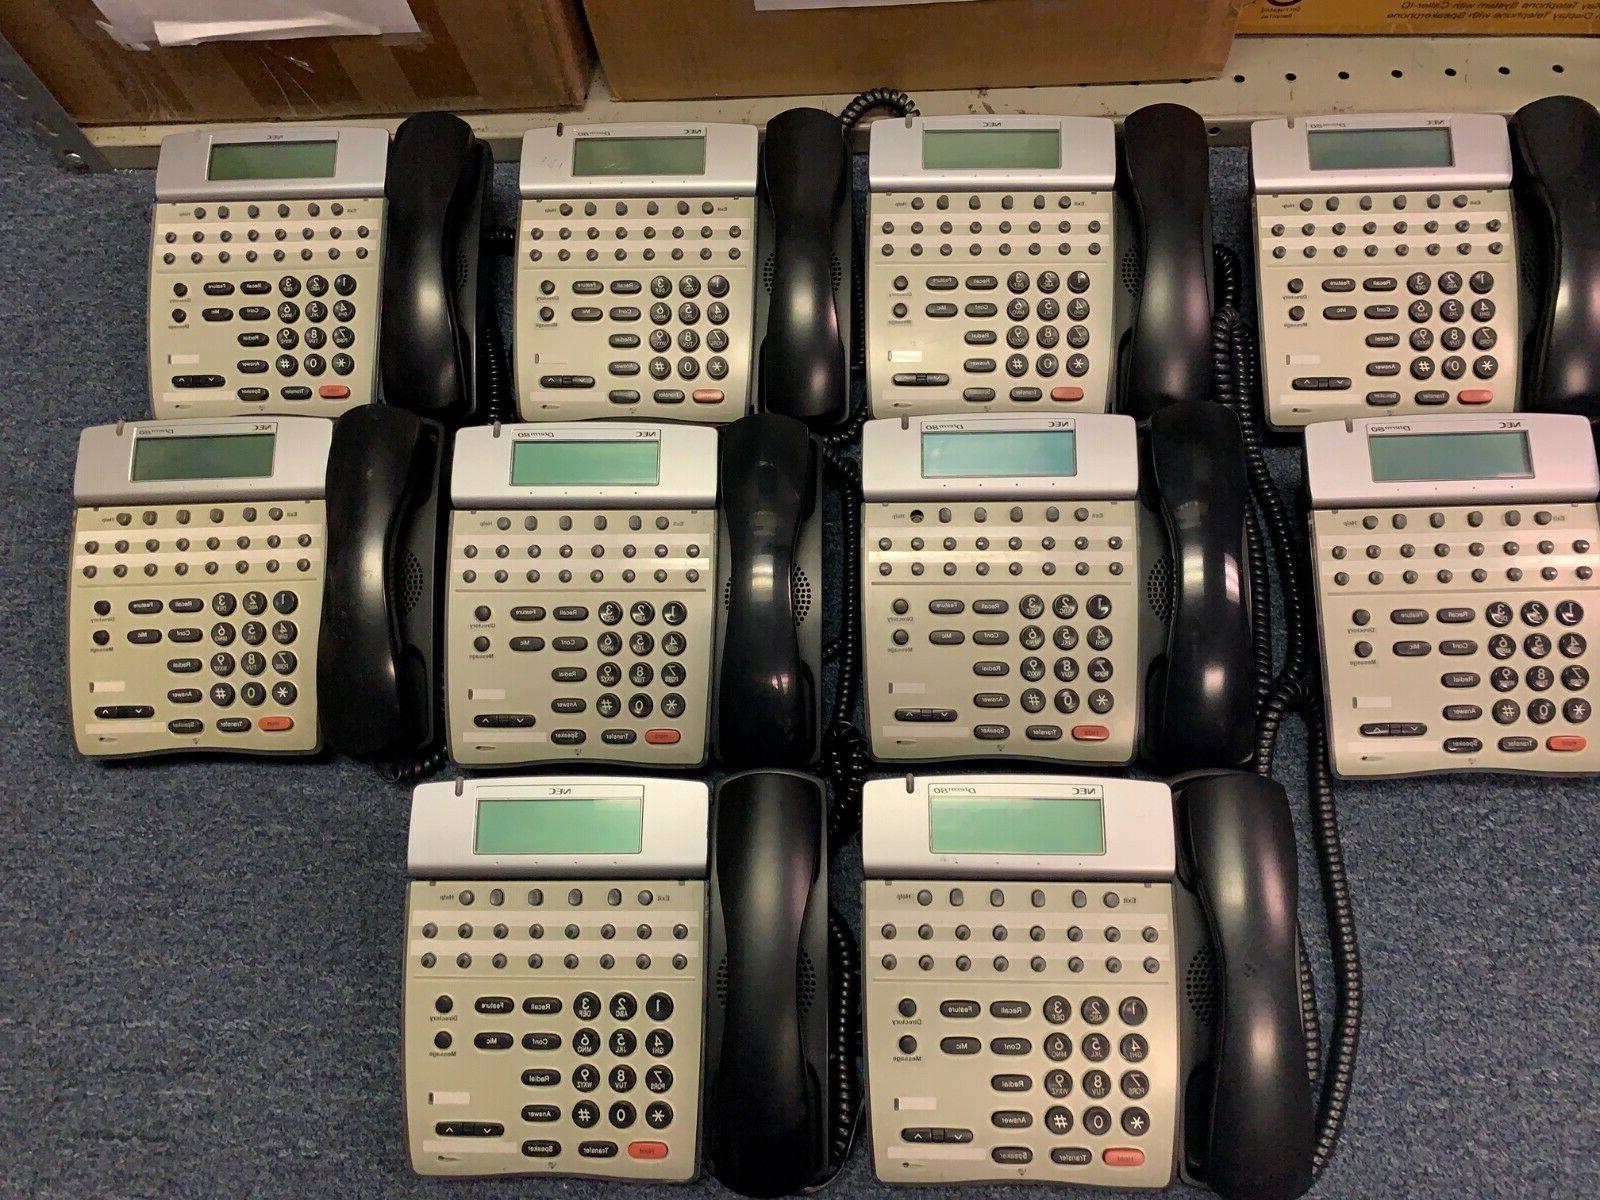 lot 10 dterm 80 telephones dth 16d